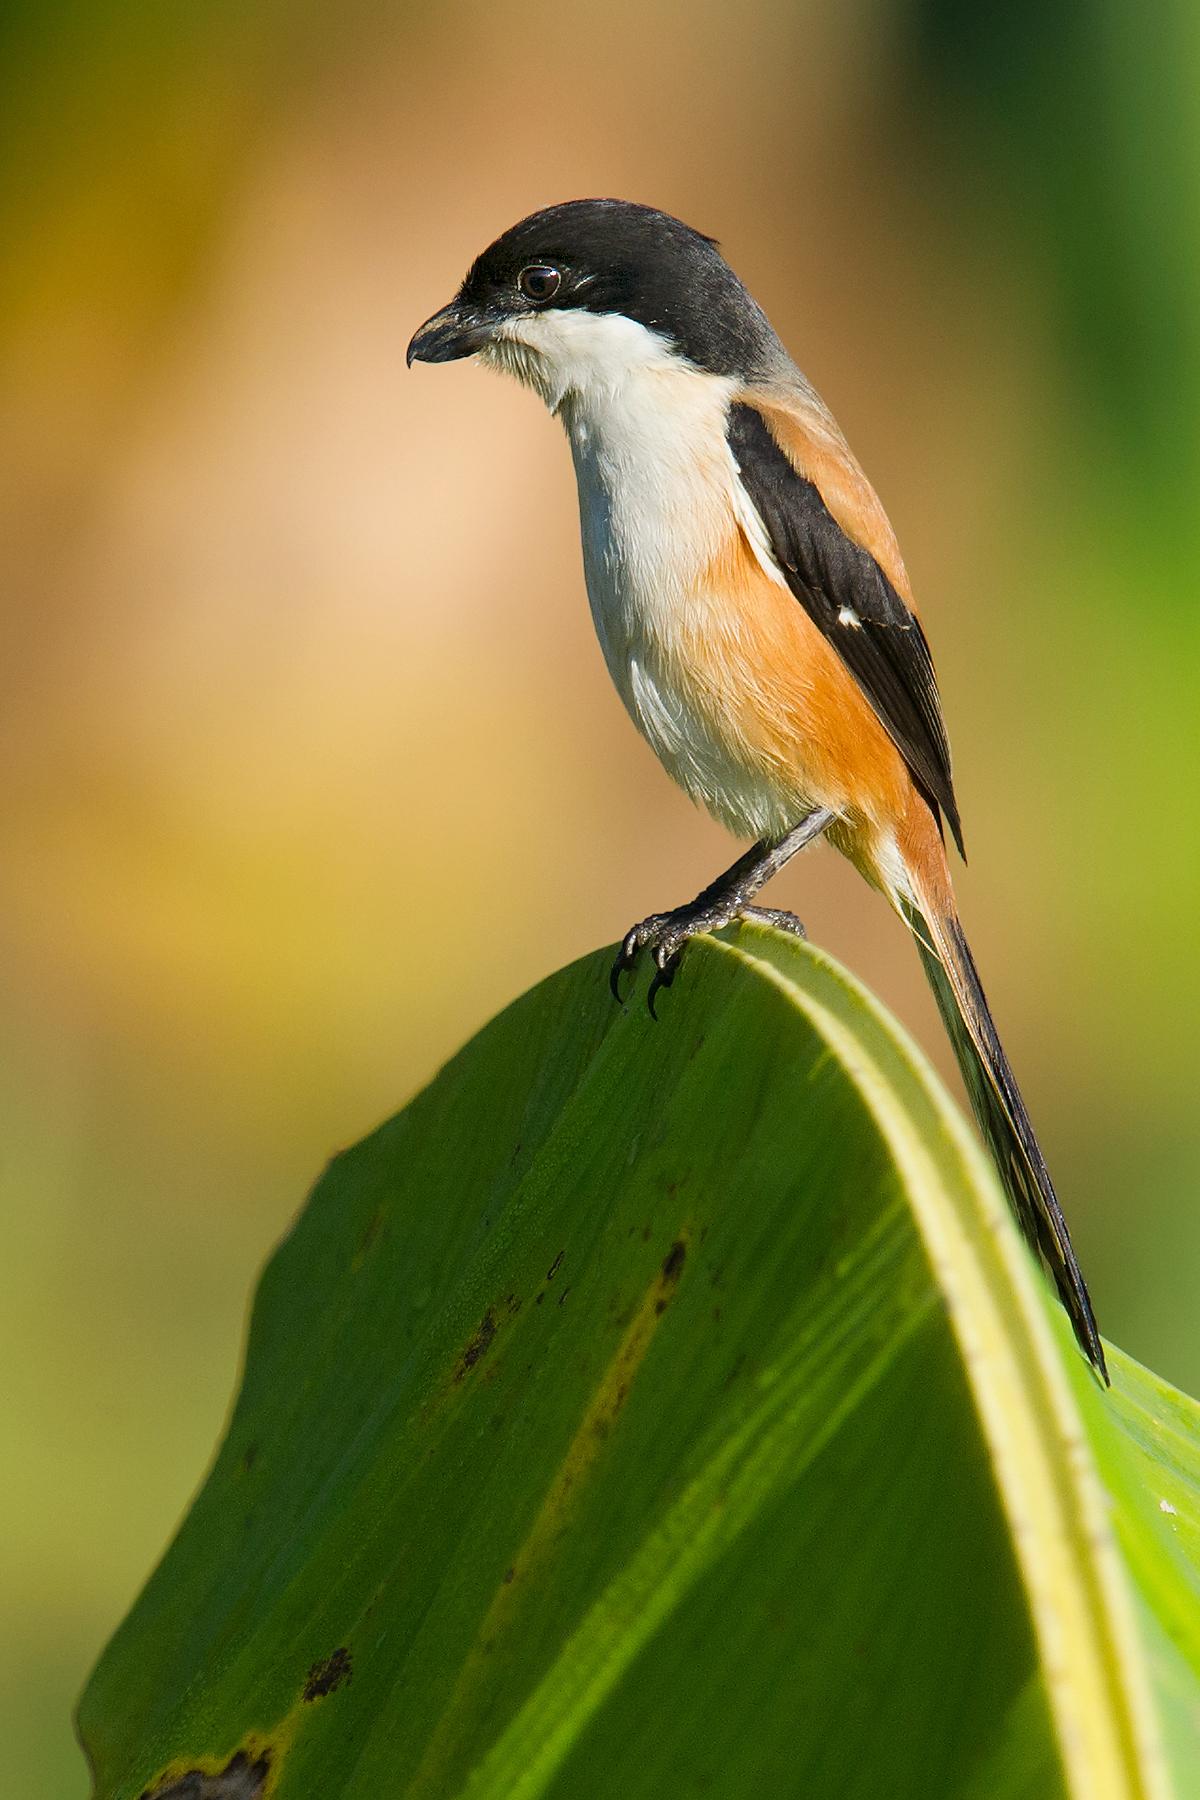 Long-tailed Shrike tricolor